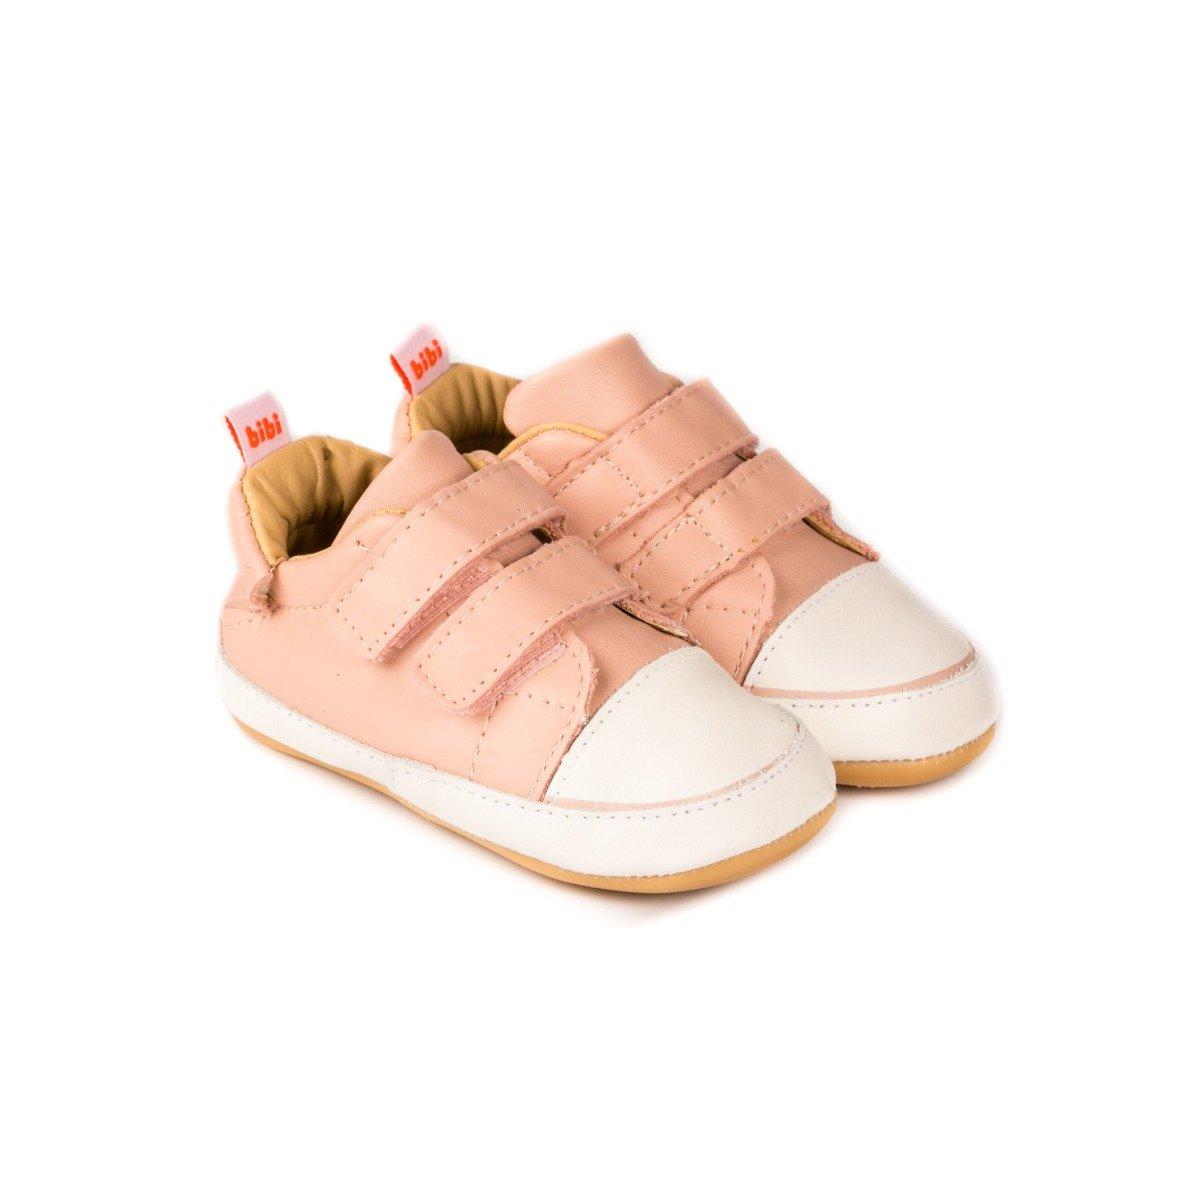 Pantofi Din Piele Bibi Shoes Afeto Joy Camelia, Roz